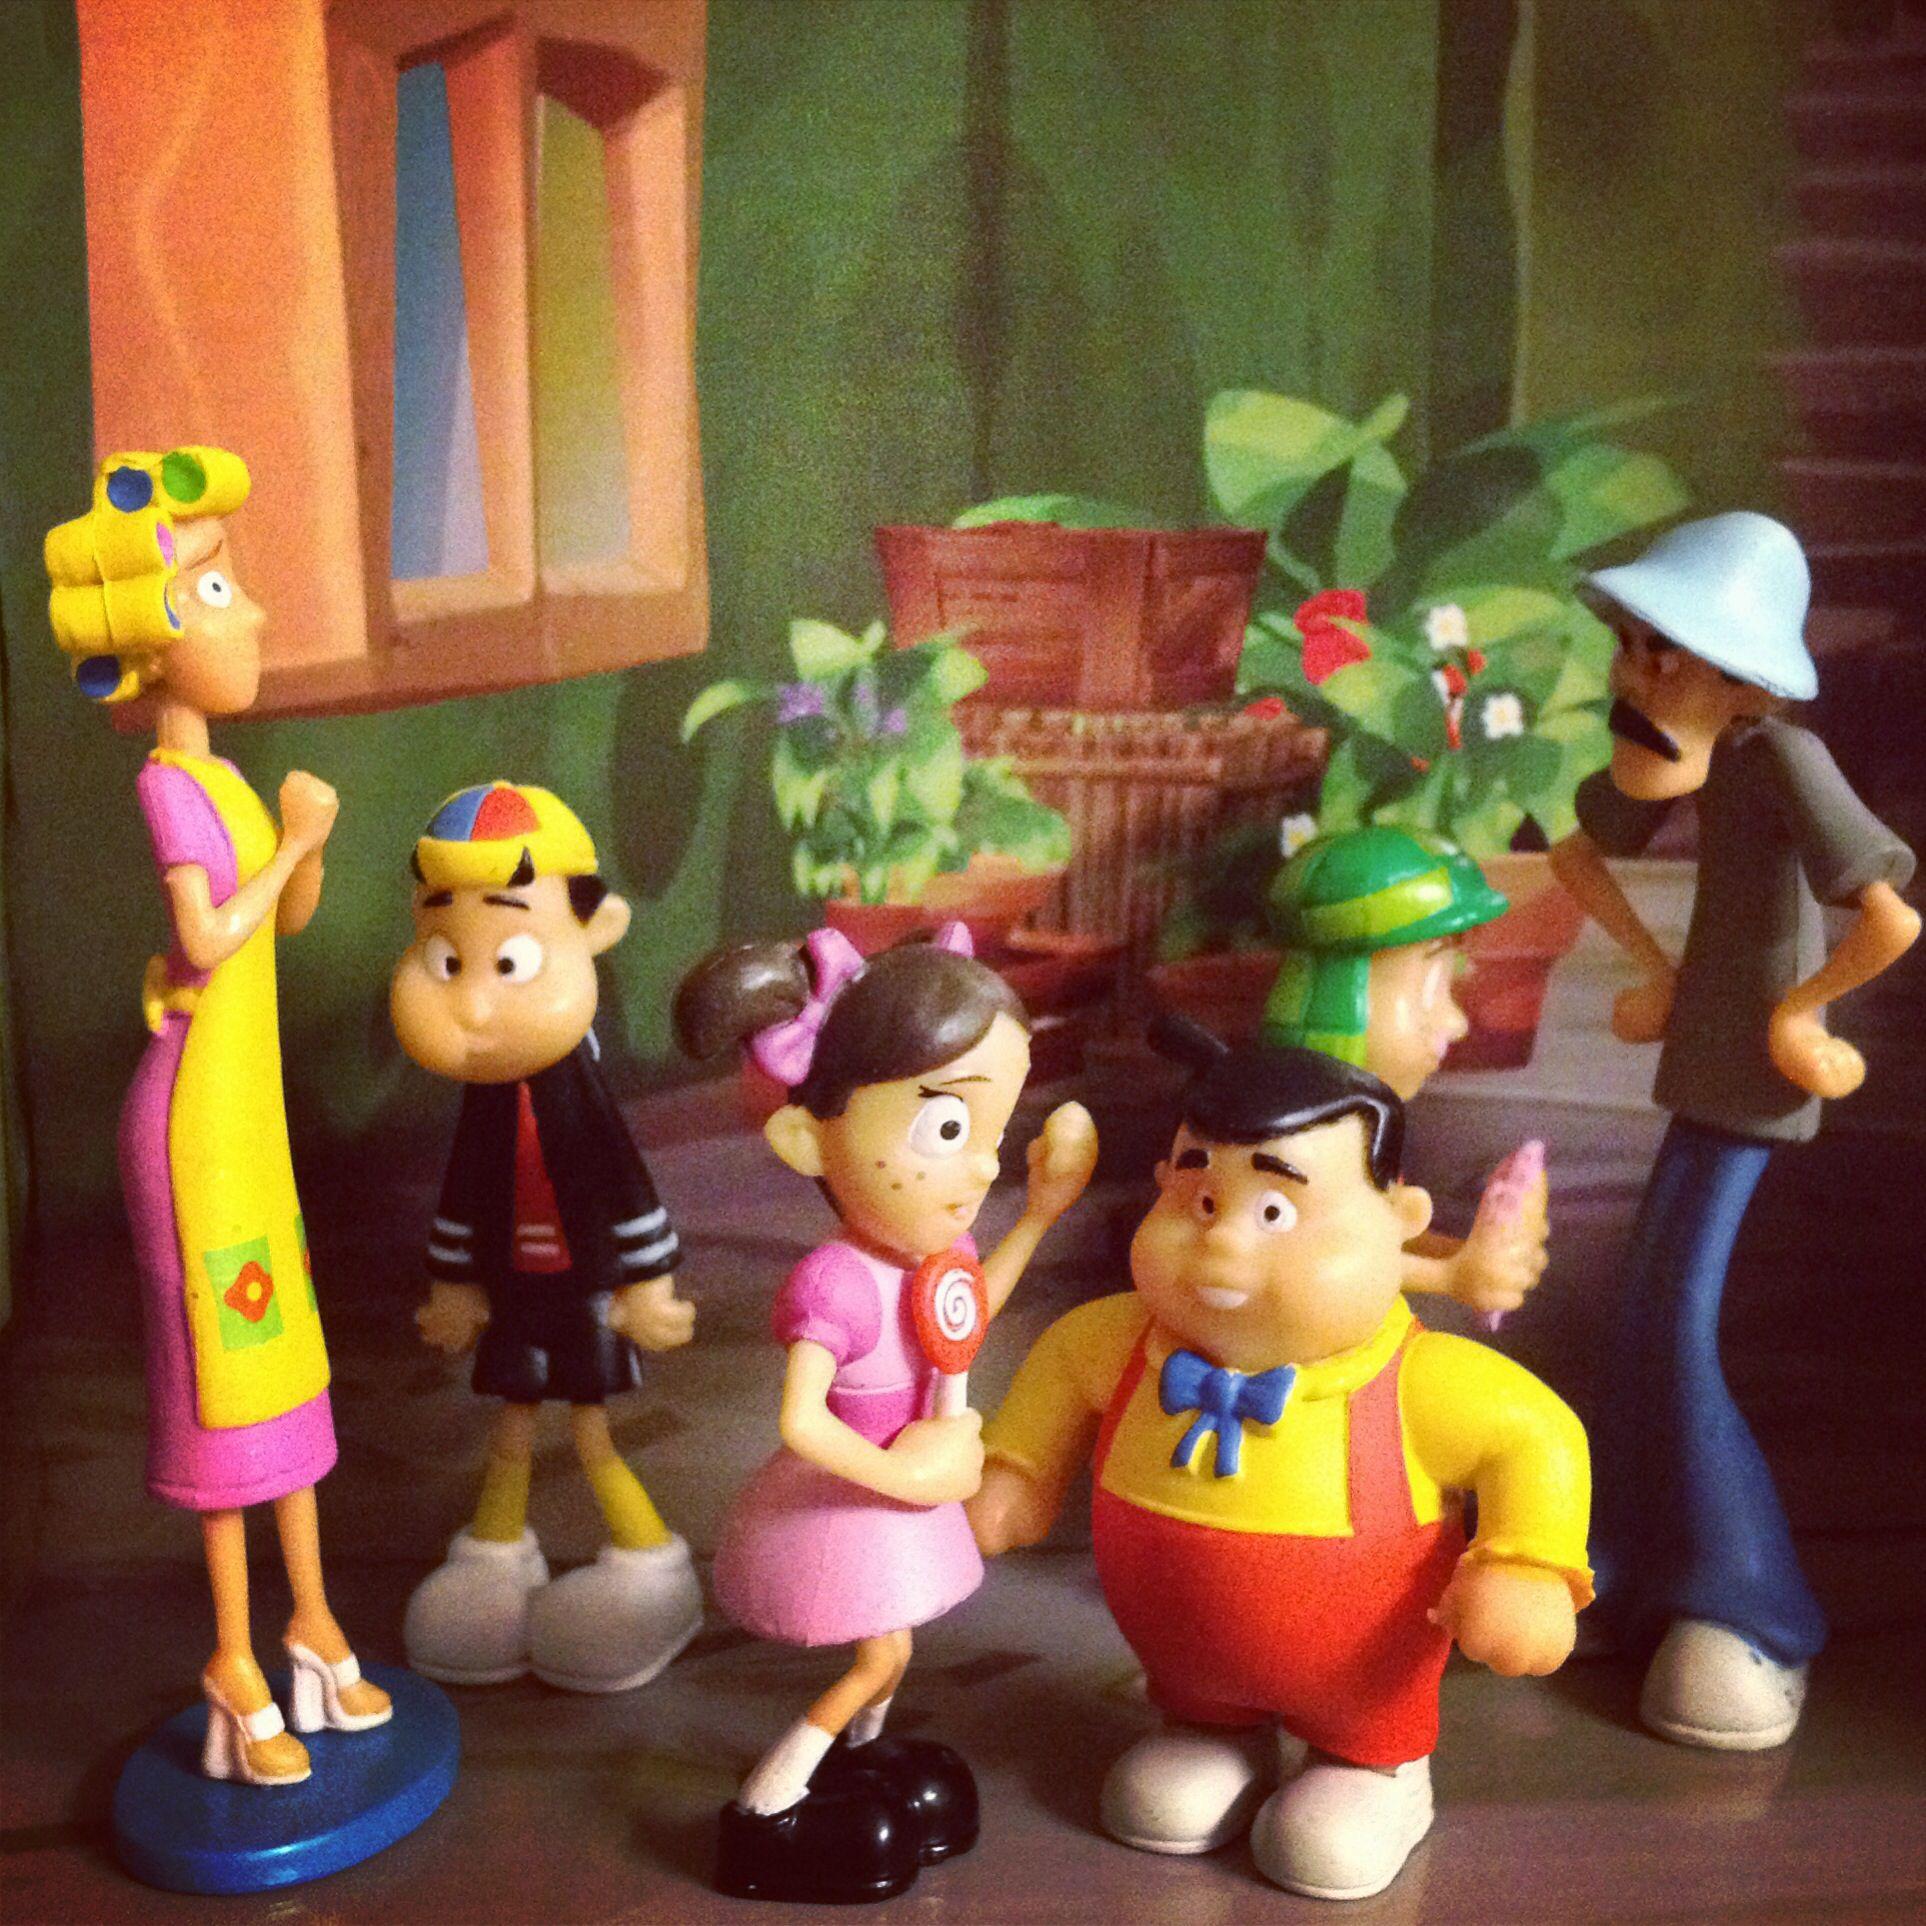 La Vecindad Del Chavo 8 Toy Fanfare Porcelana Fr